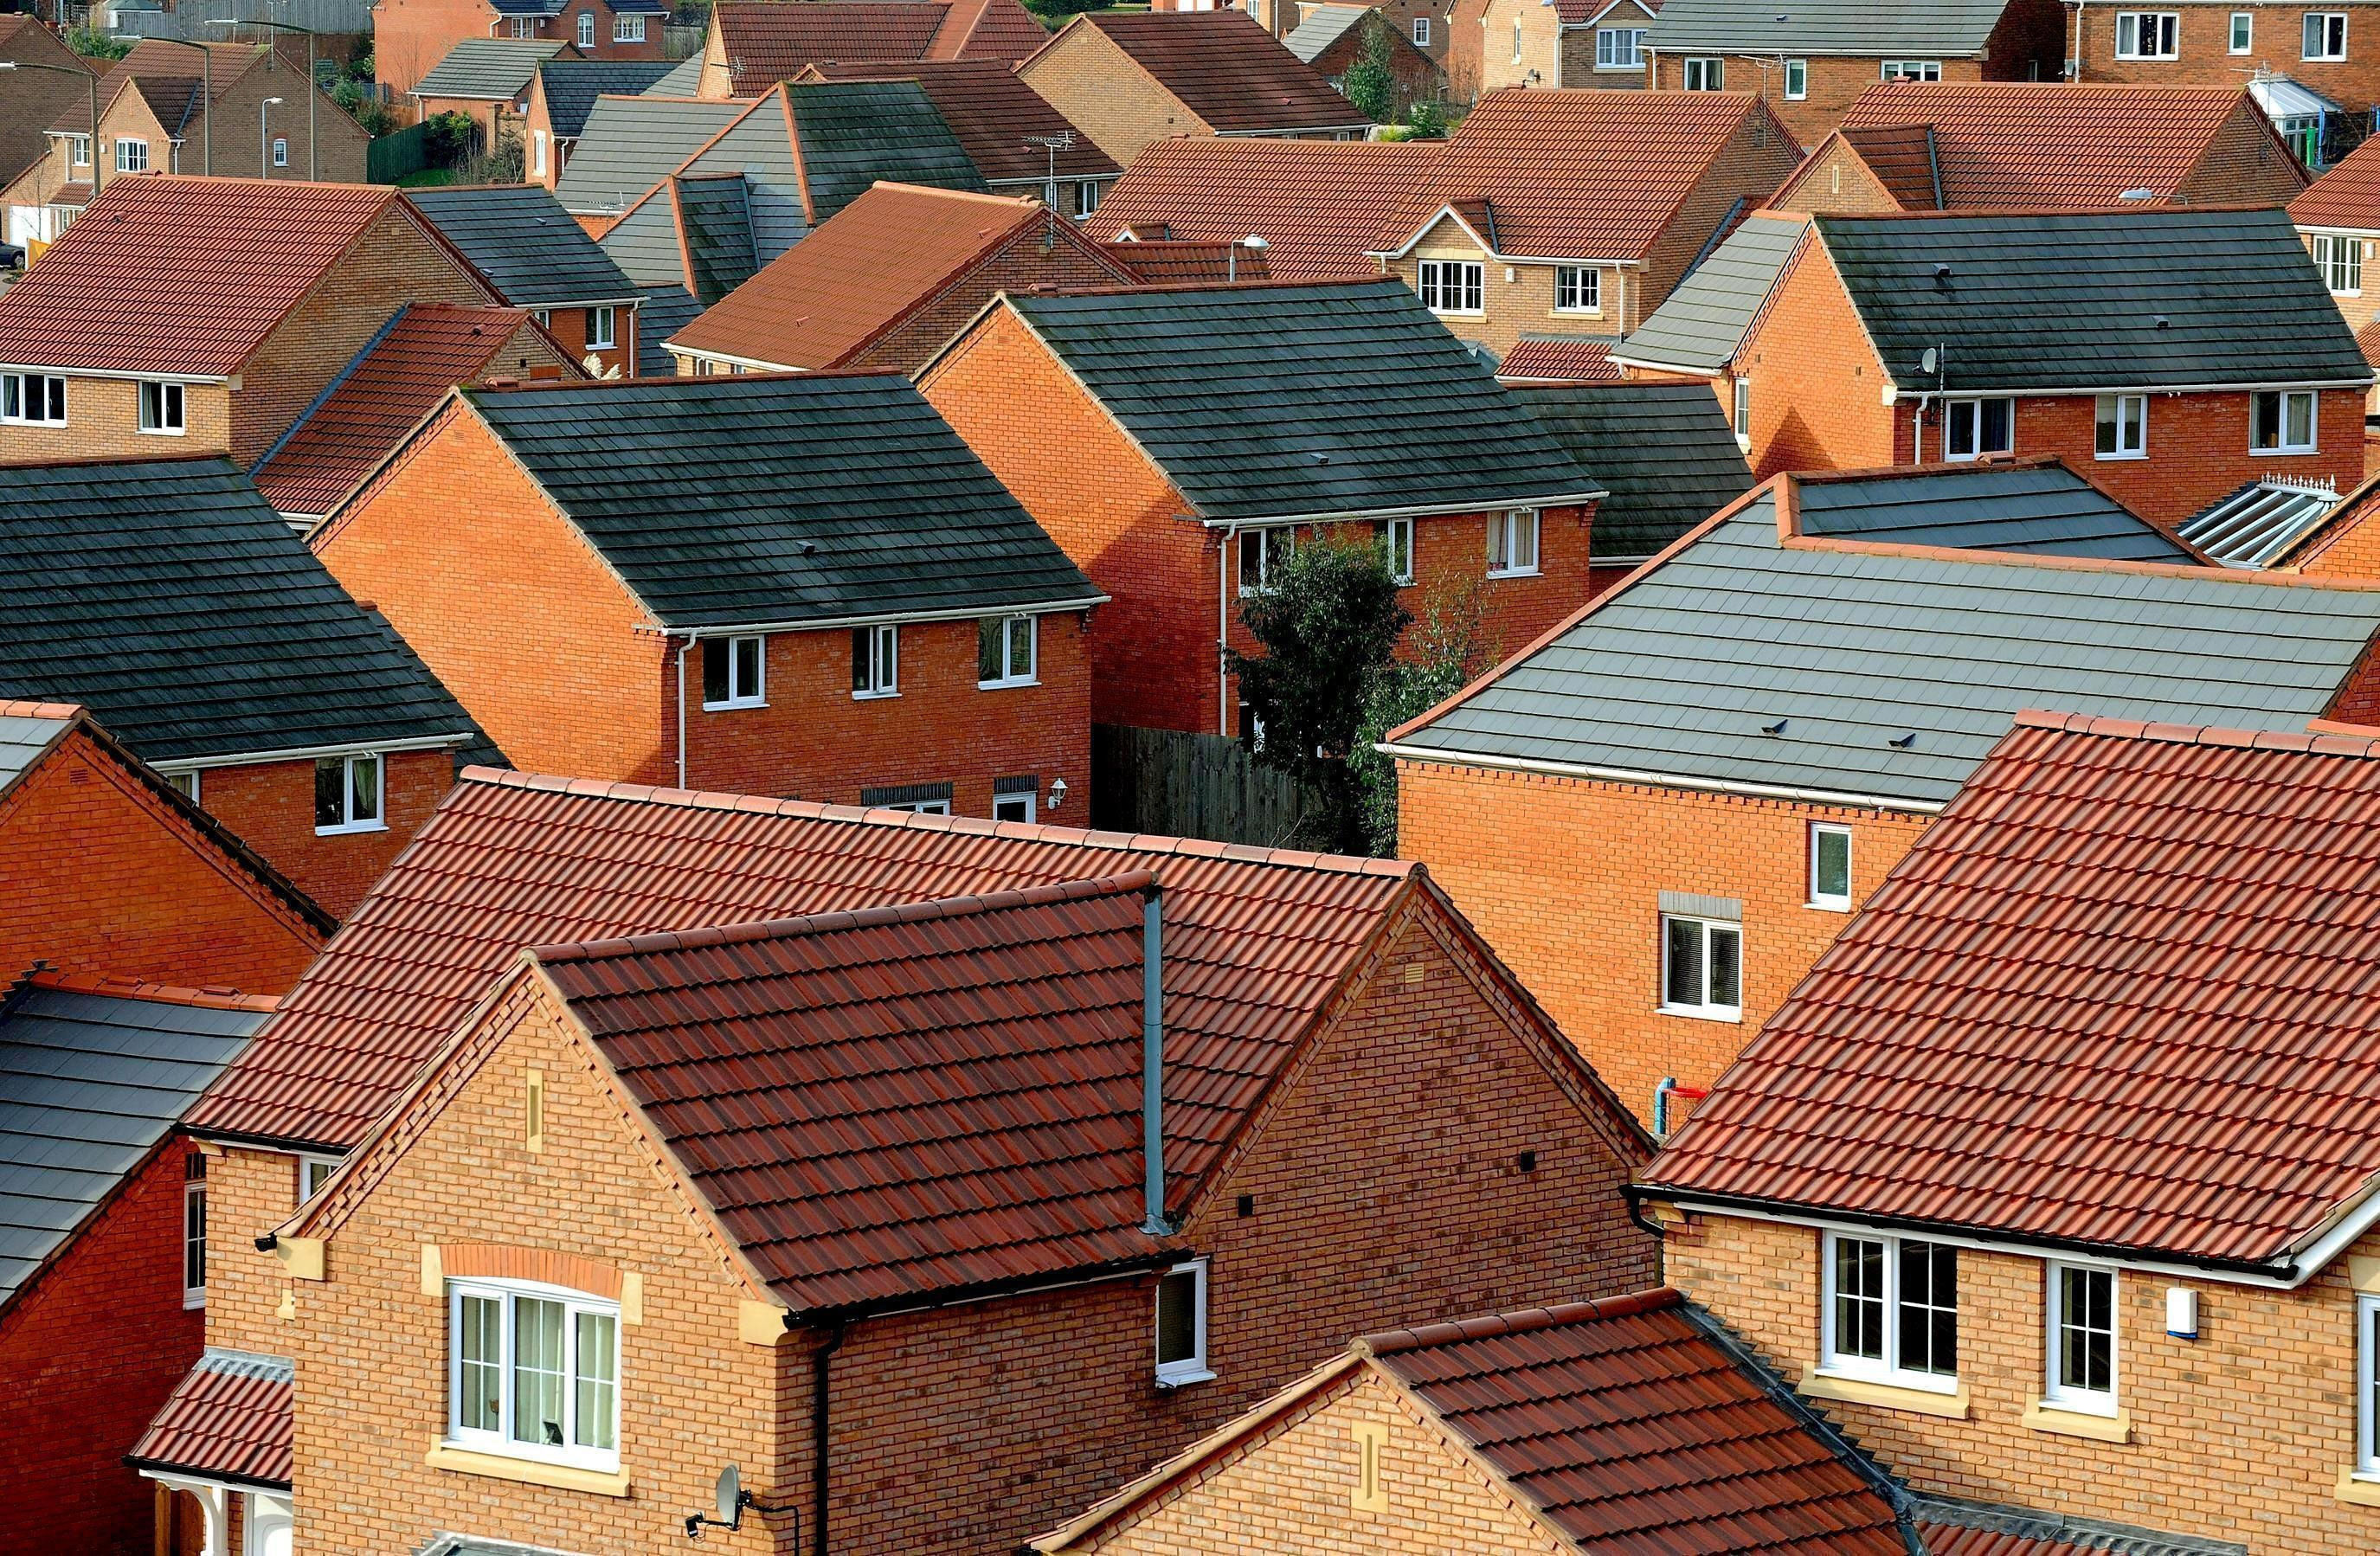 Shared ownership guru Kush Rawal: house prices need stability